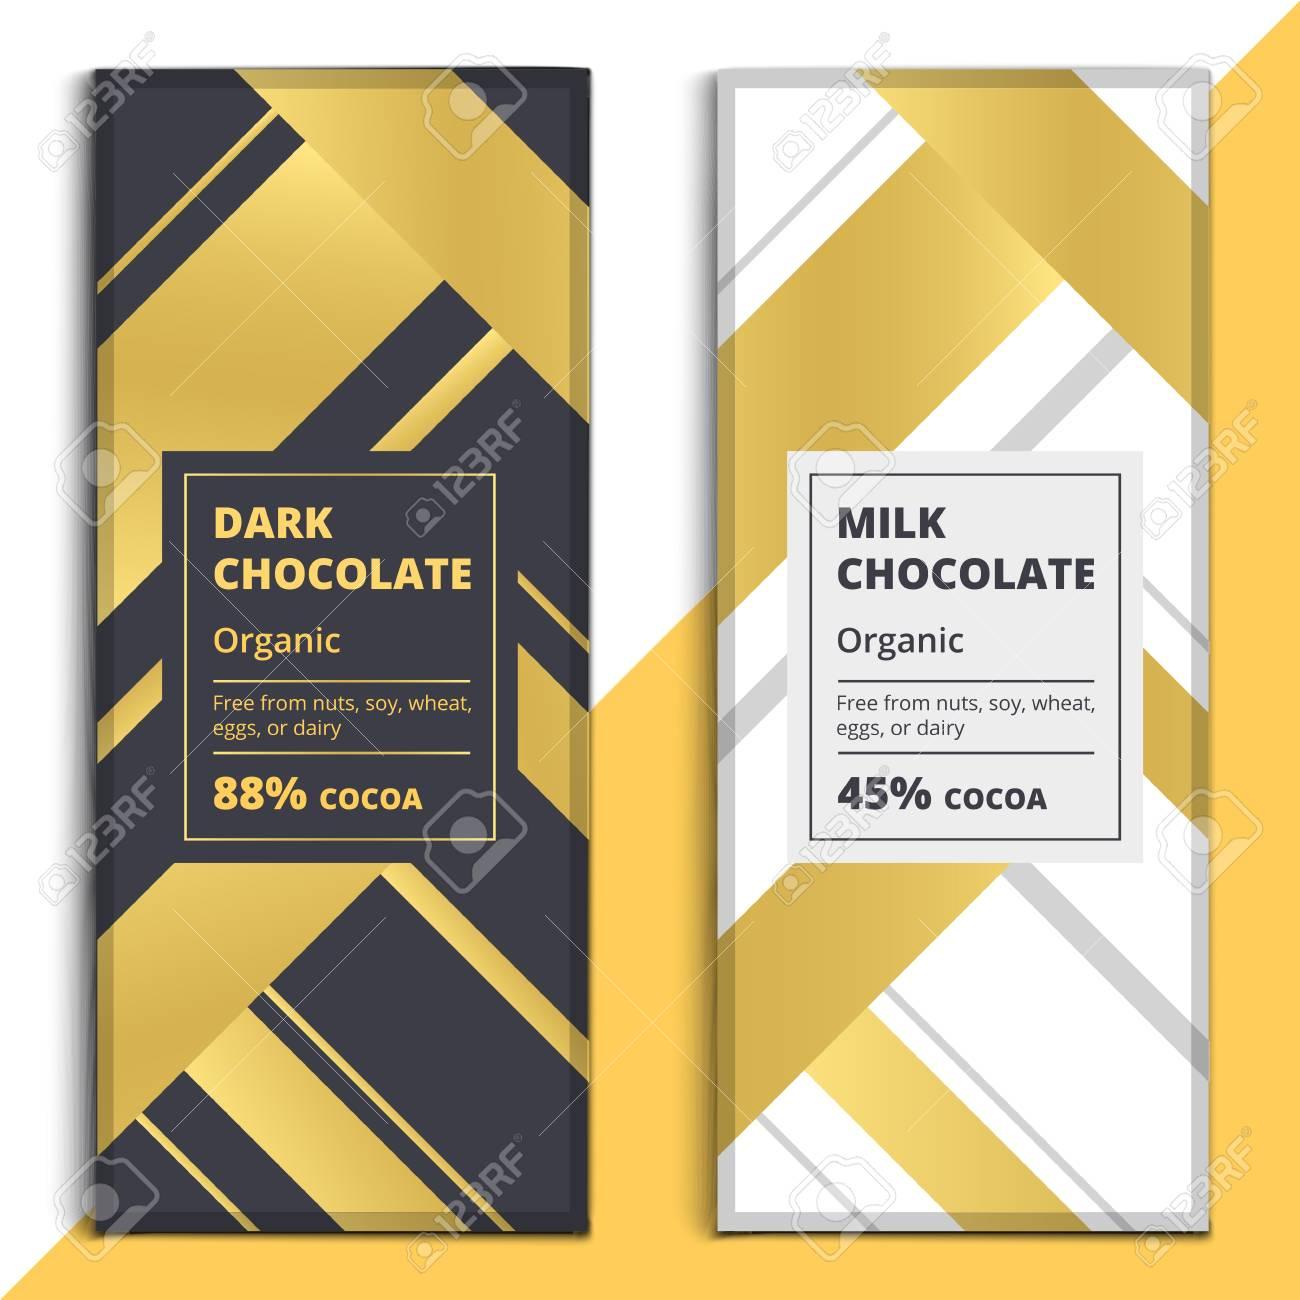 Oscuro Orgánica Y Diseño De Barra De Chocolate Con Leche. Choco ...